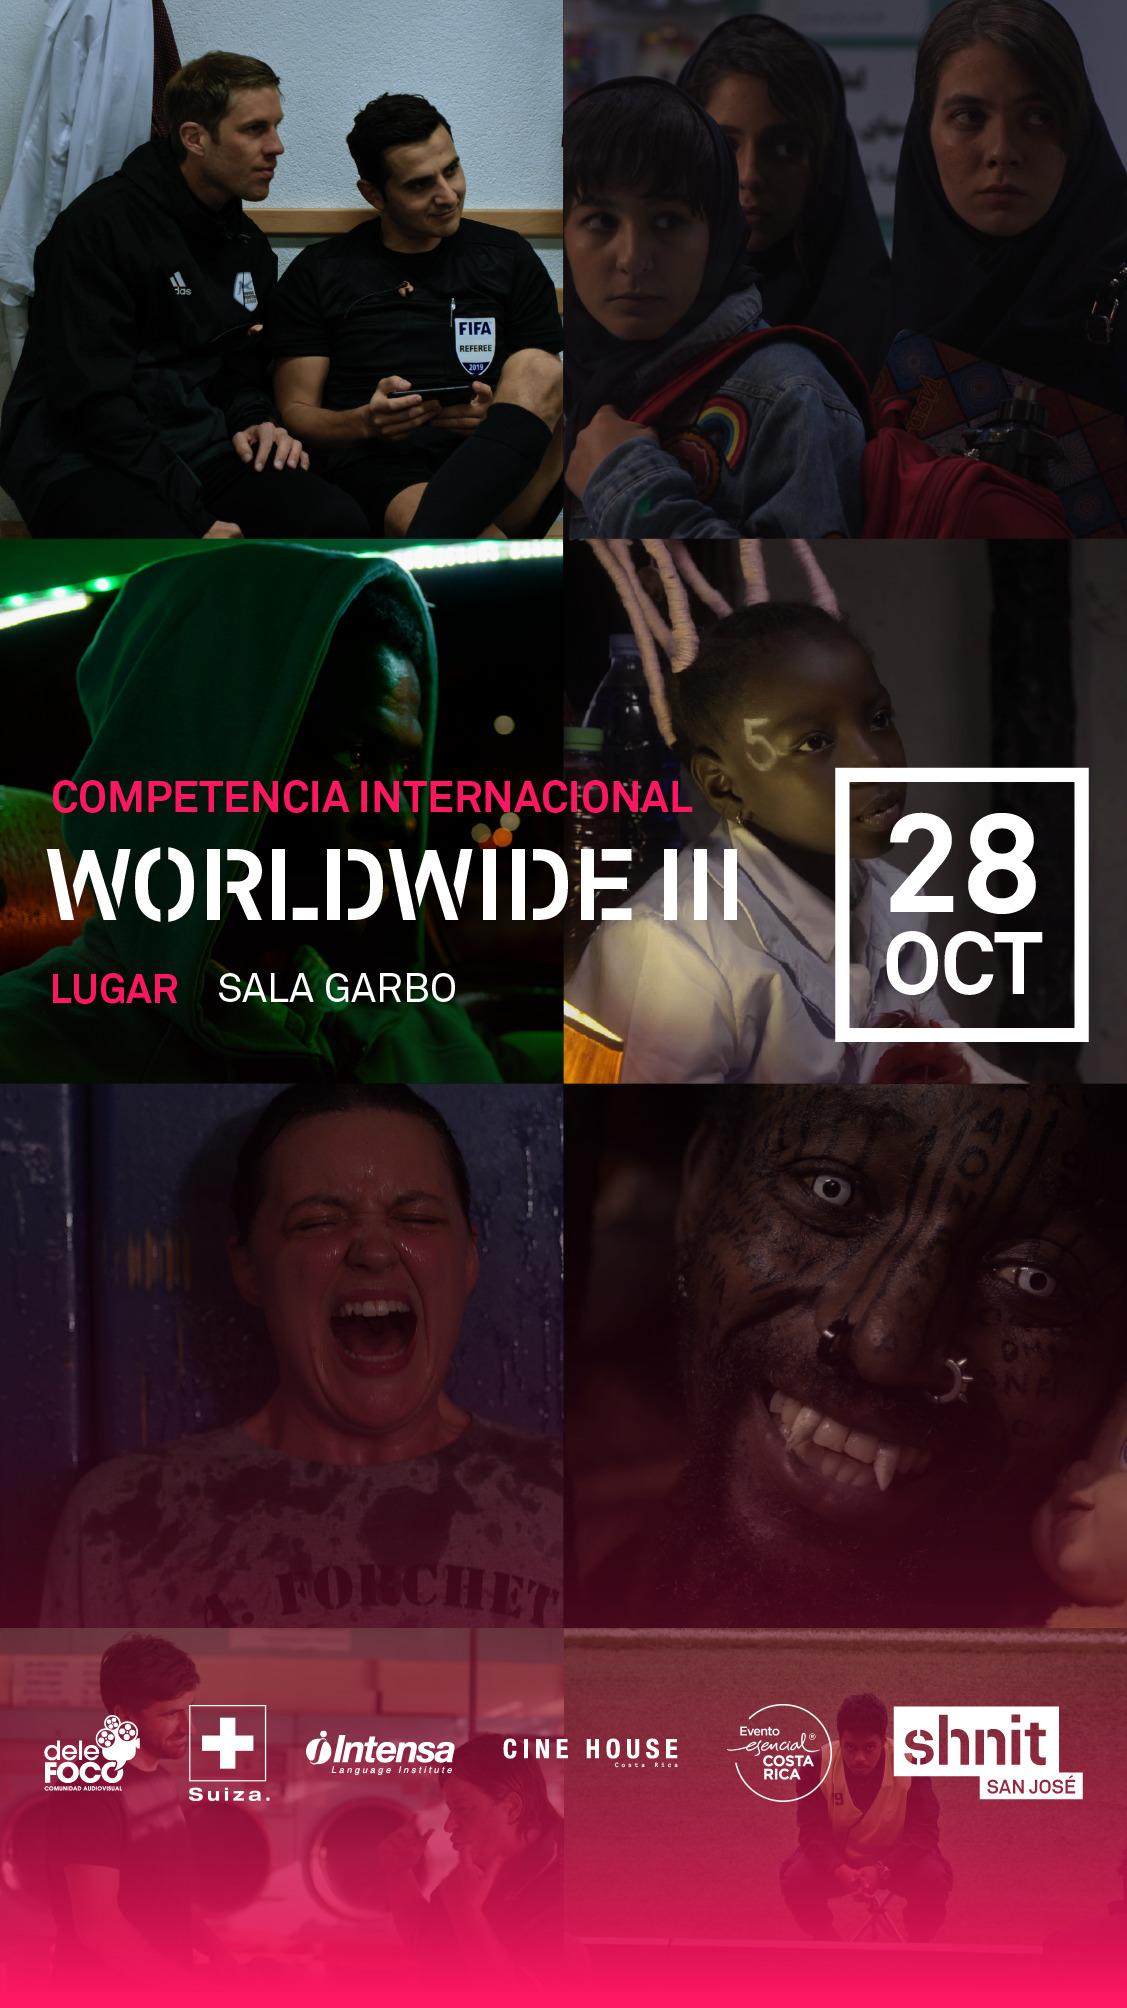 Afiche de Worldwide III SHNIT